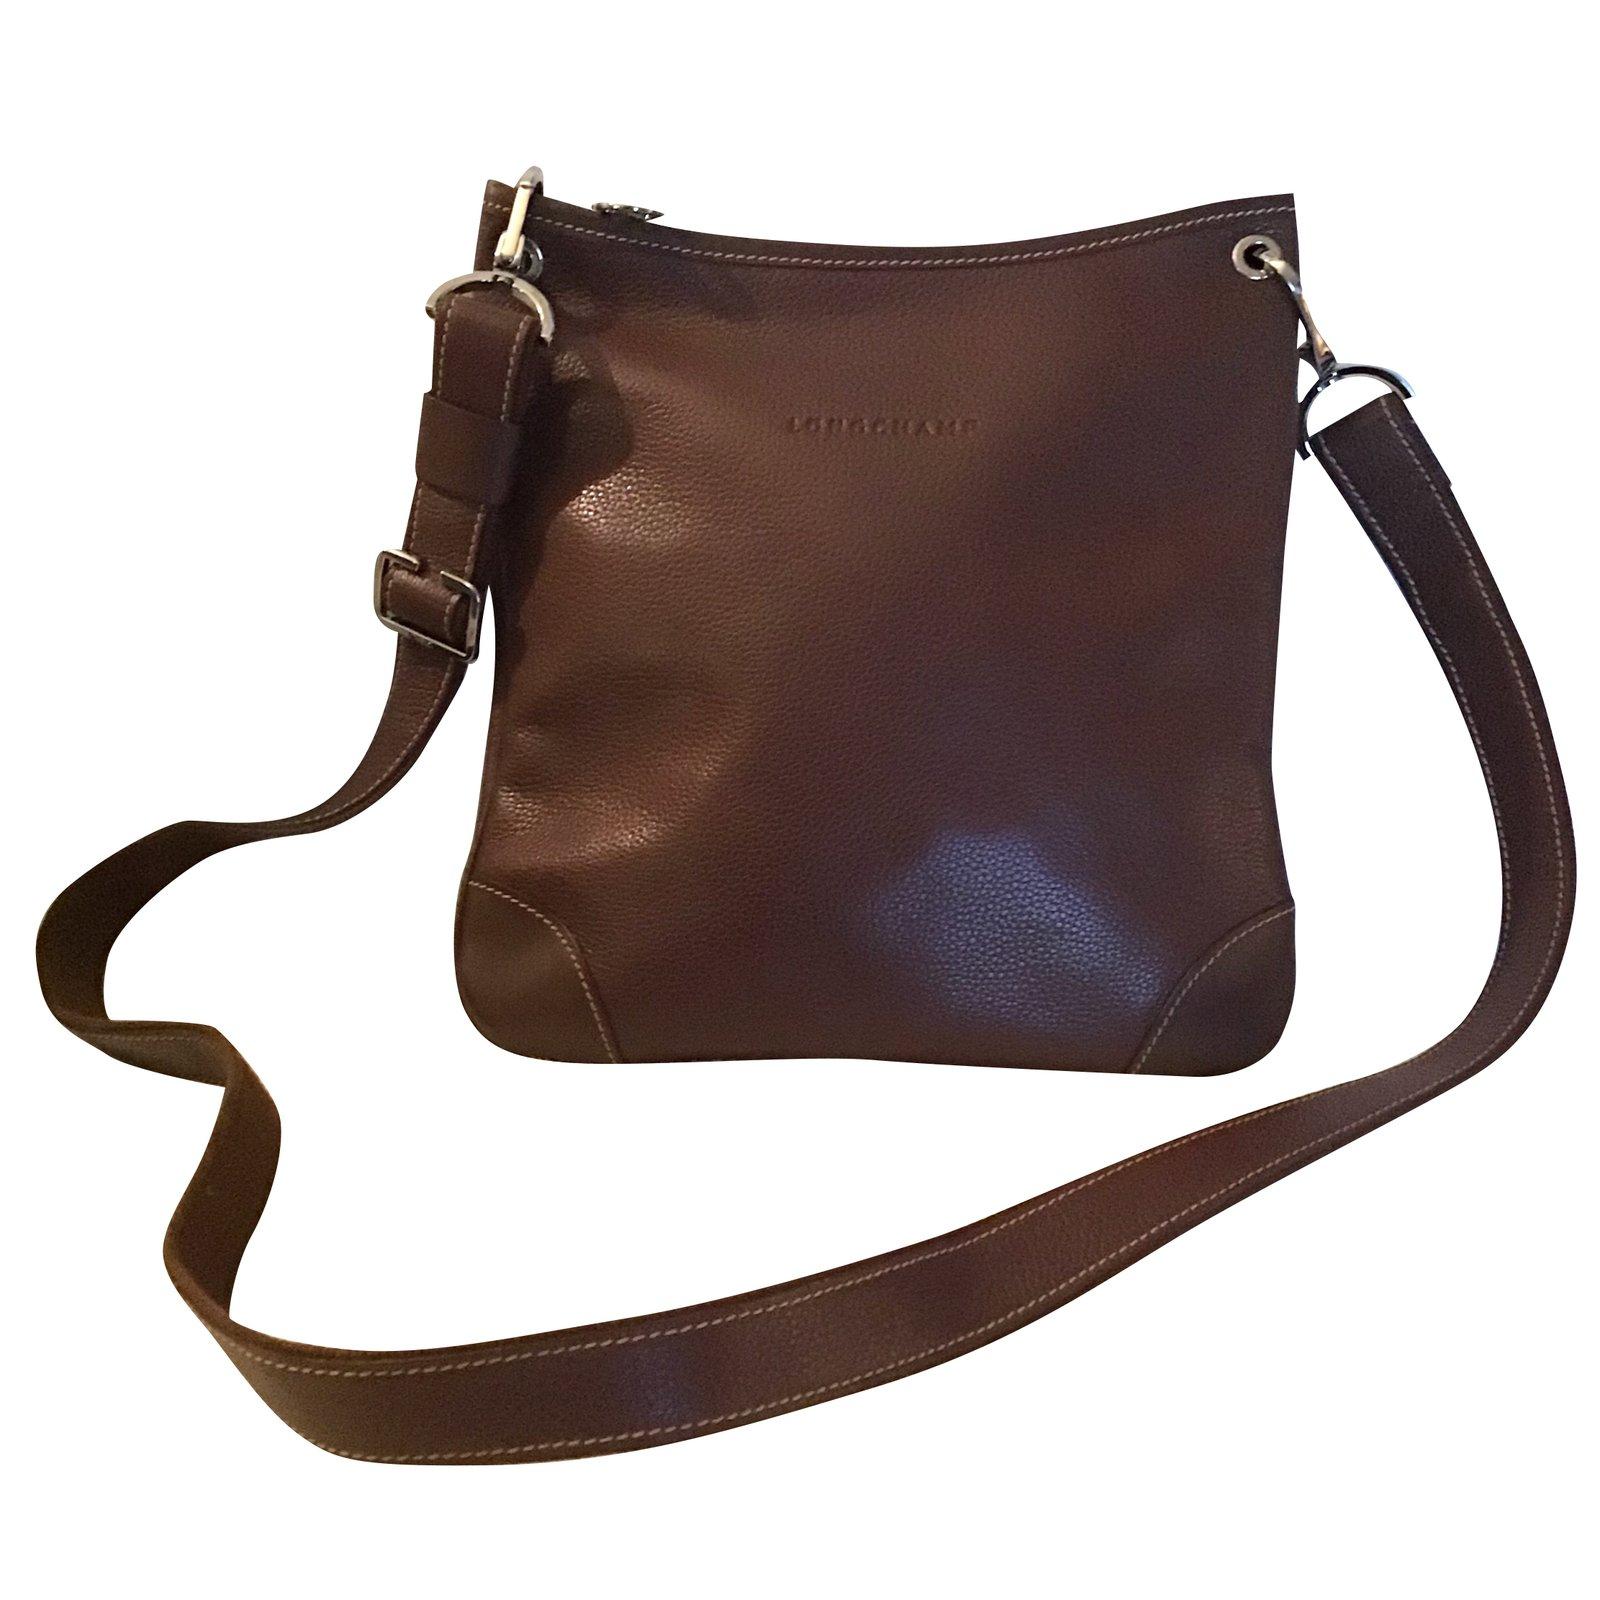 188b5f3dea48 Longchamp Handbags Handbags Leather Dark brown ref.92082 - Joli Closet